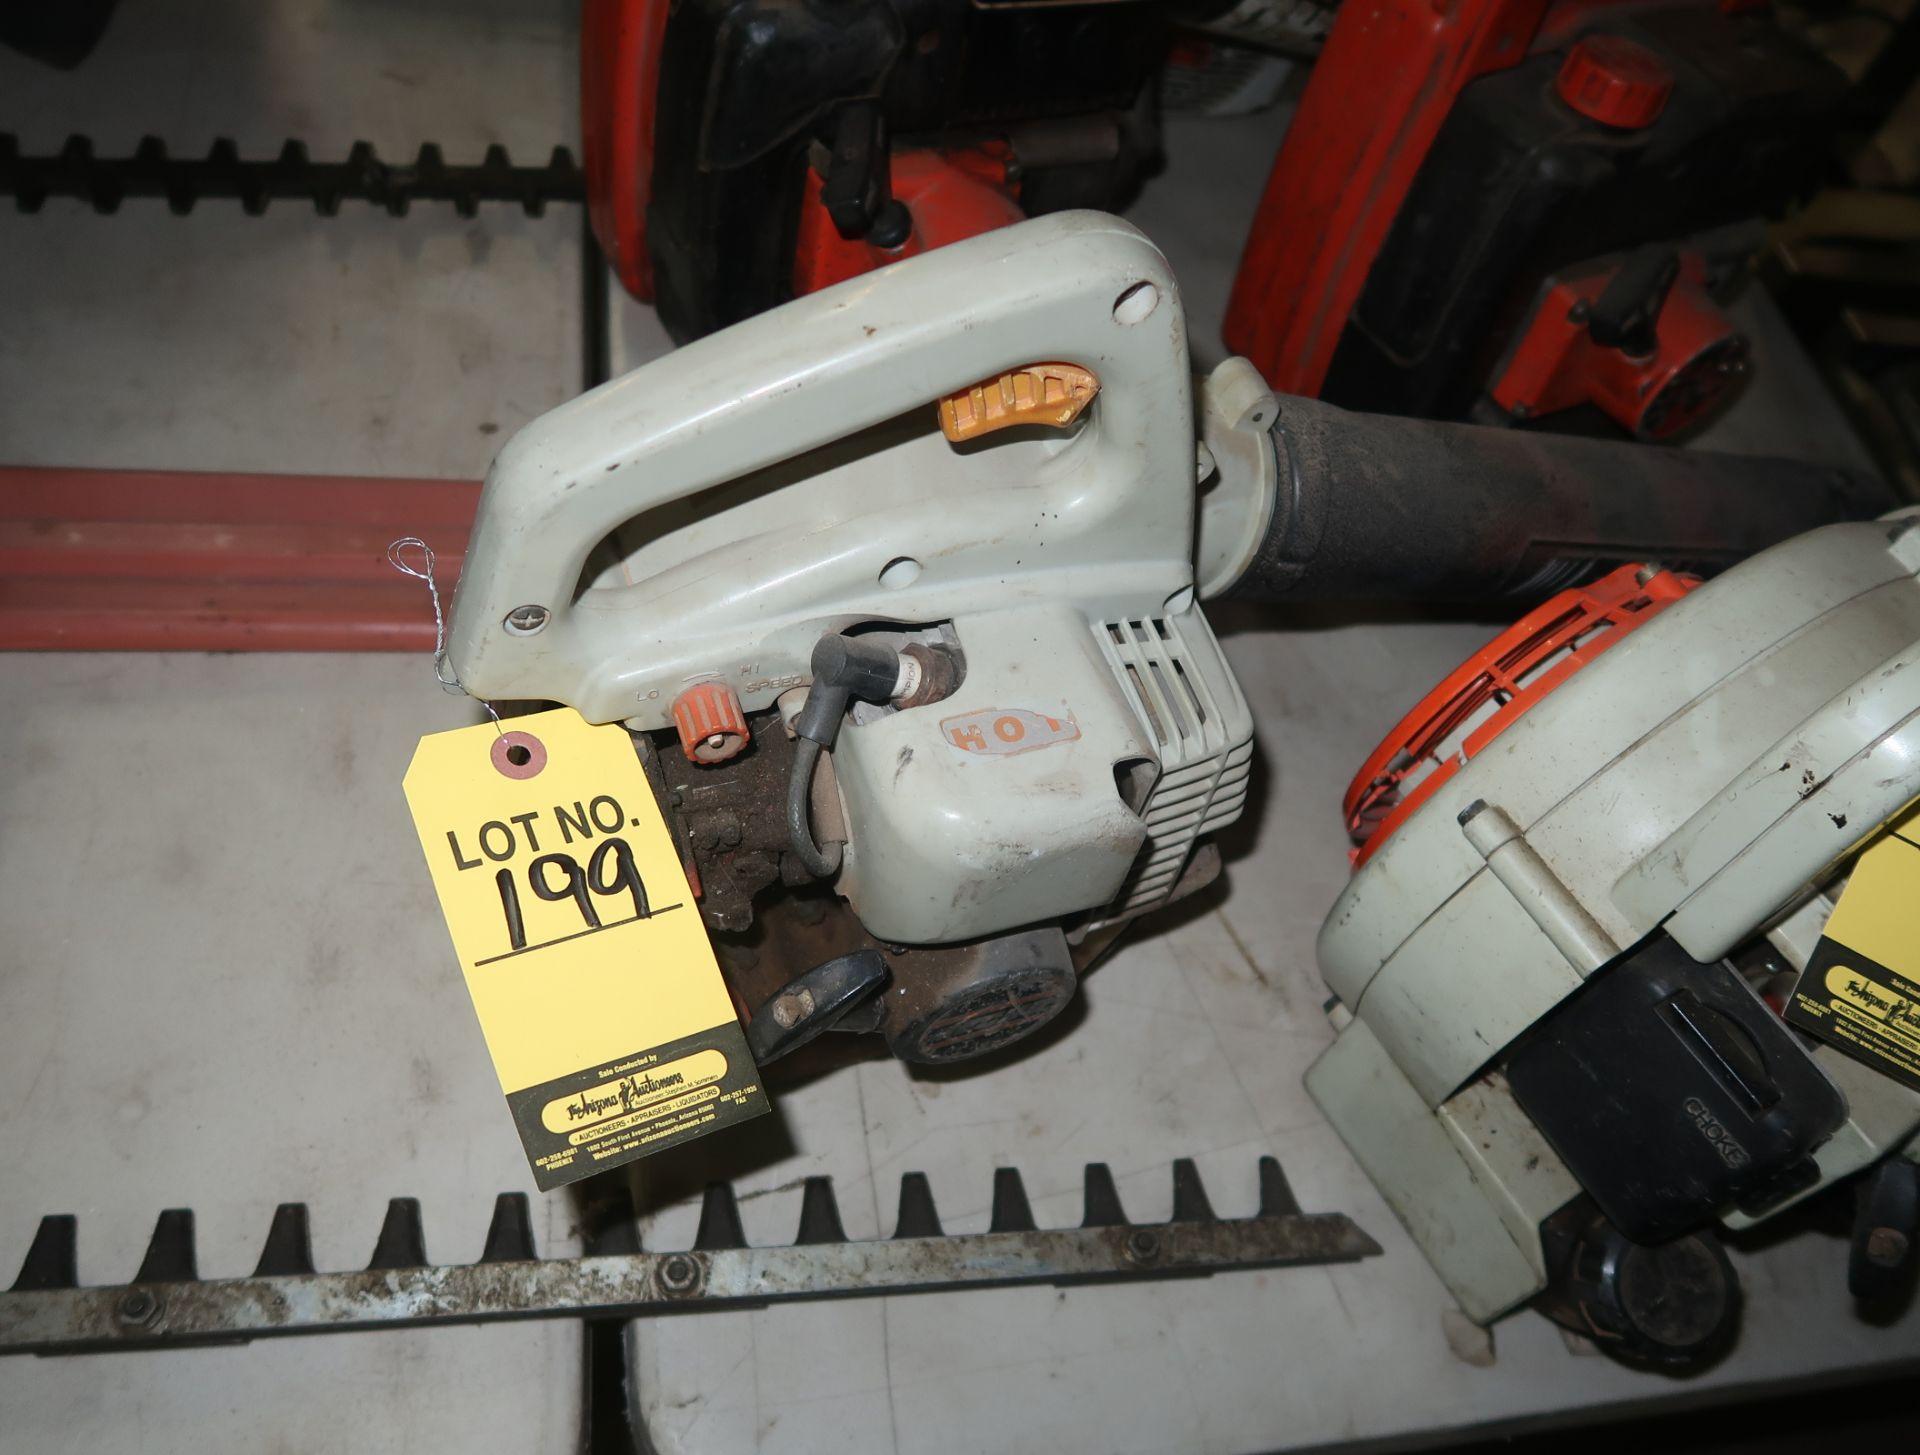 Lot 199 - ECHO PB-1000 POWER BLOWER